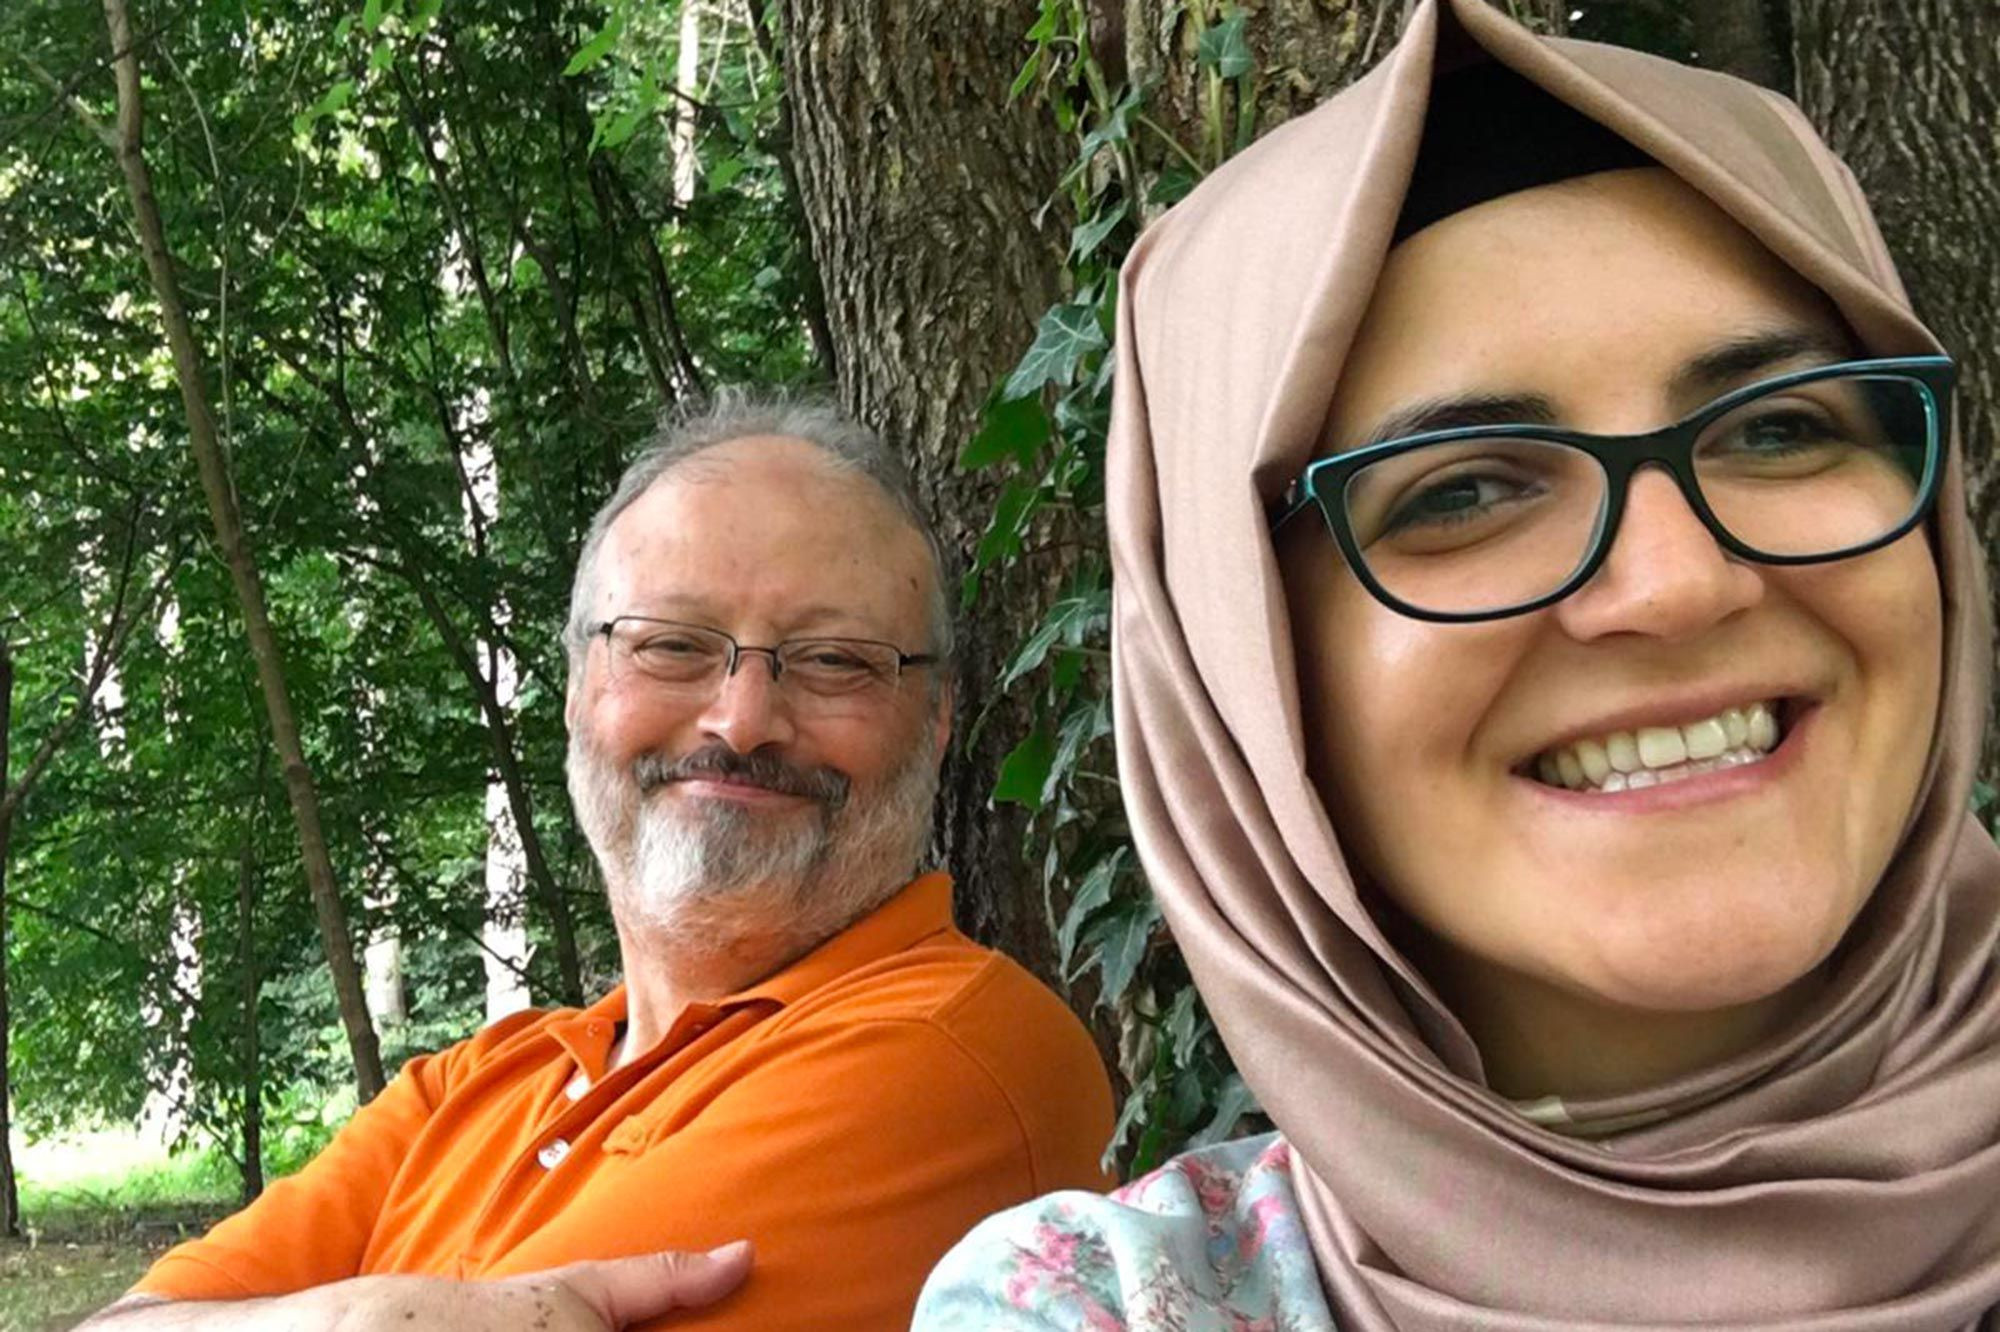 No one has the right to pardon his killers - Jamal Khashoggi